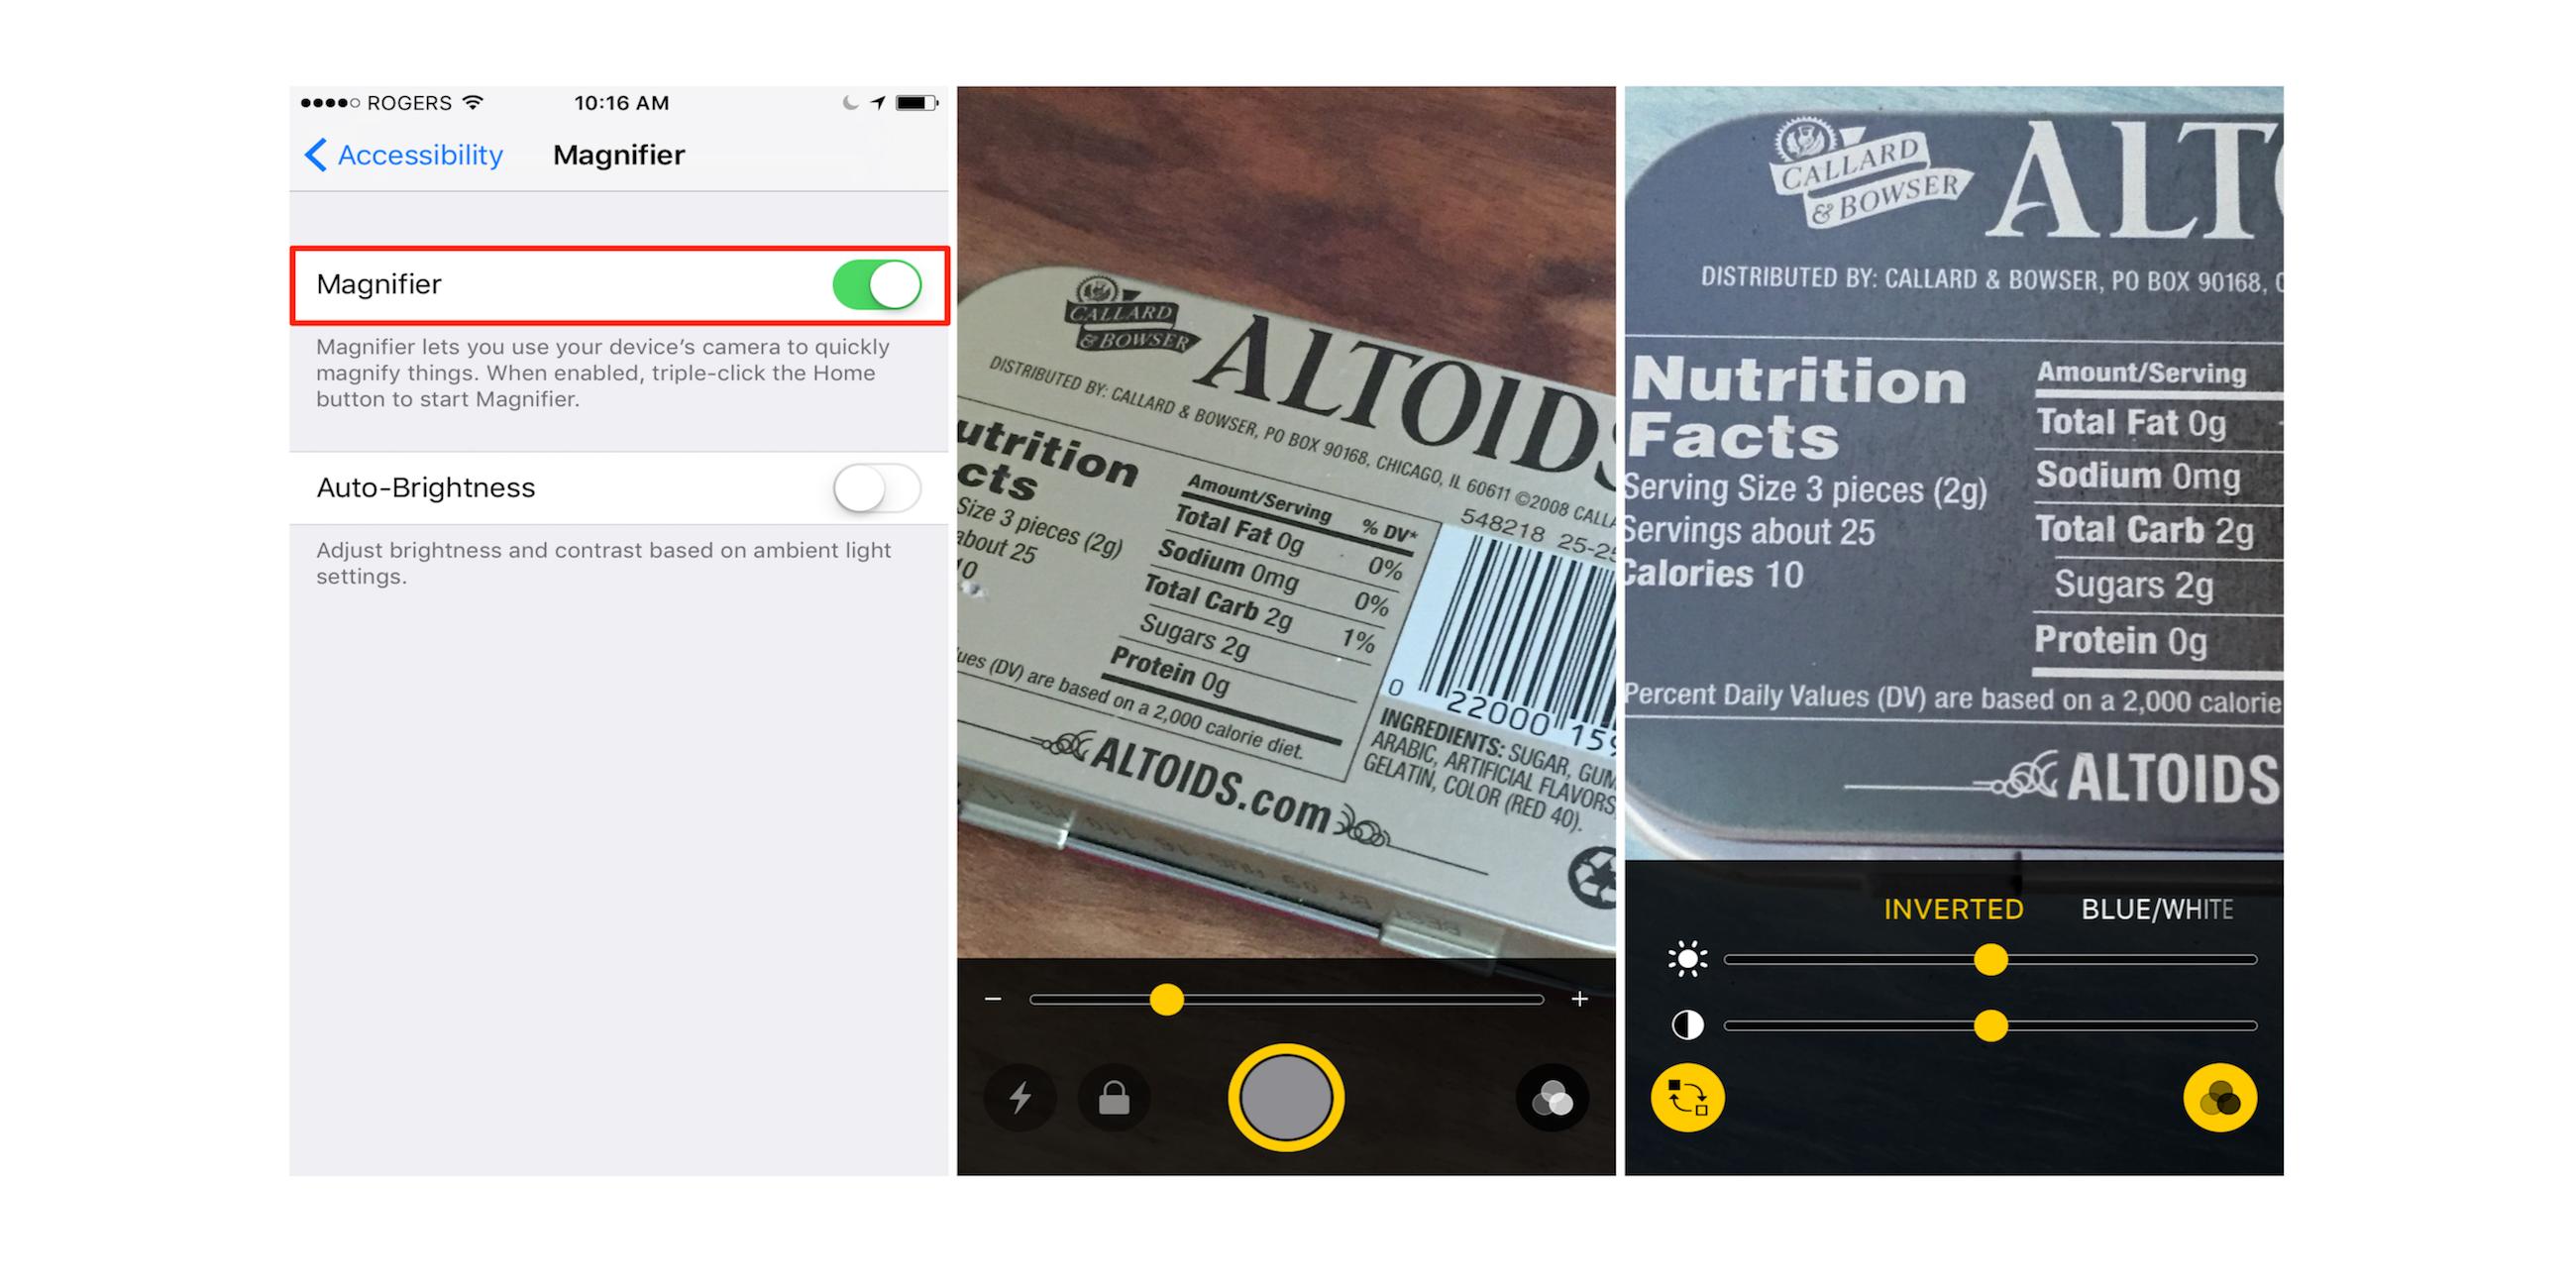 "<span href=""https://9to5mac.com/2016/09/26/how-to-use-ios-10-magnifier-magnifying-glass-iphone/"">Cómo utilizar iOS 10 ocultas de la 'Lupa' lupa característica para iPhone</a>"